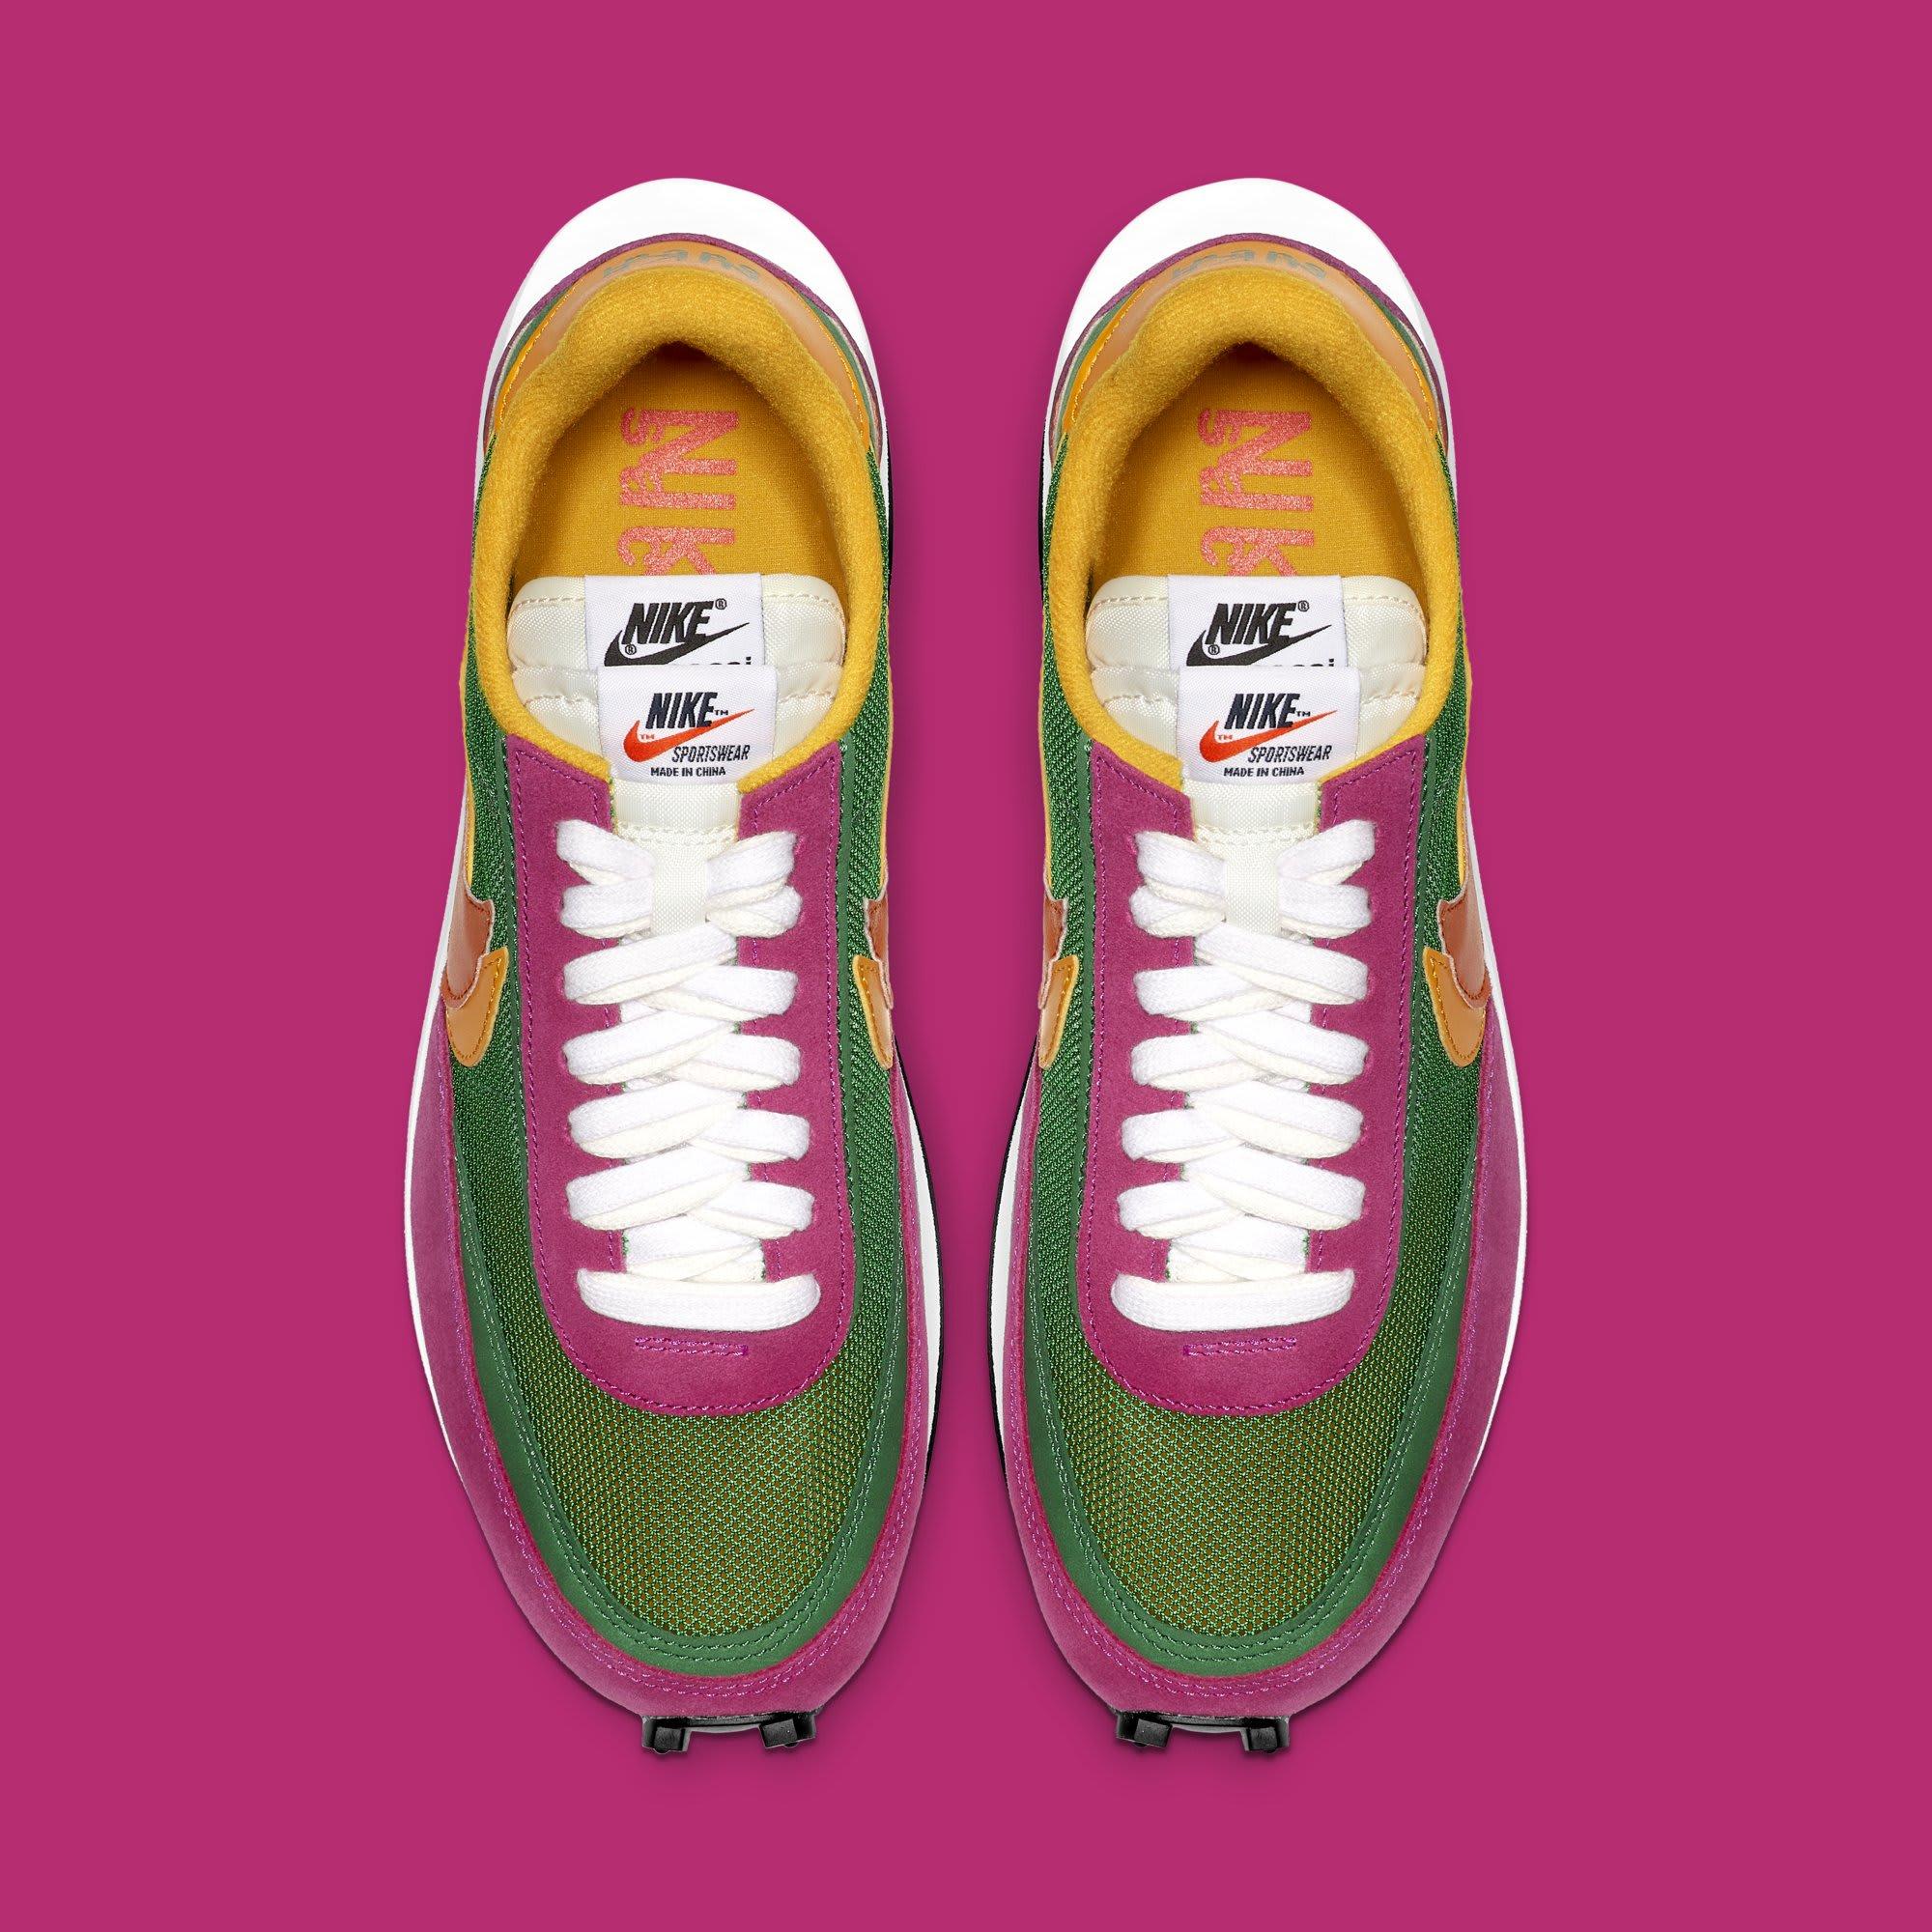 Sacai x Nike LDWaffle BV0073-301 (Top)